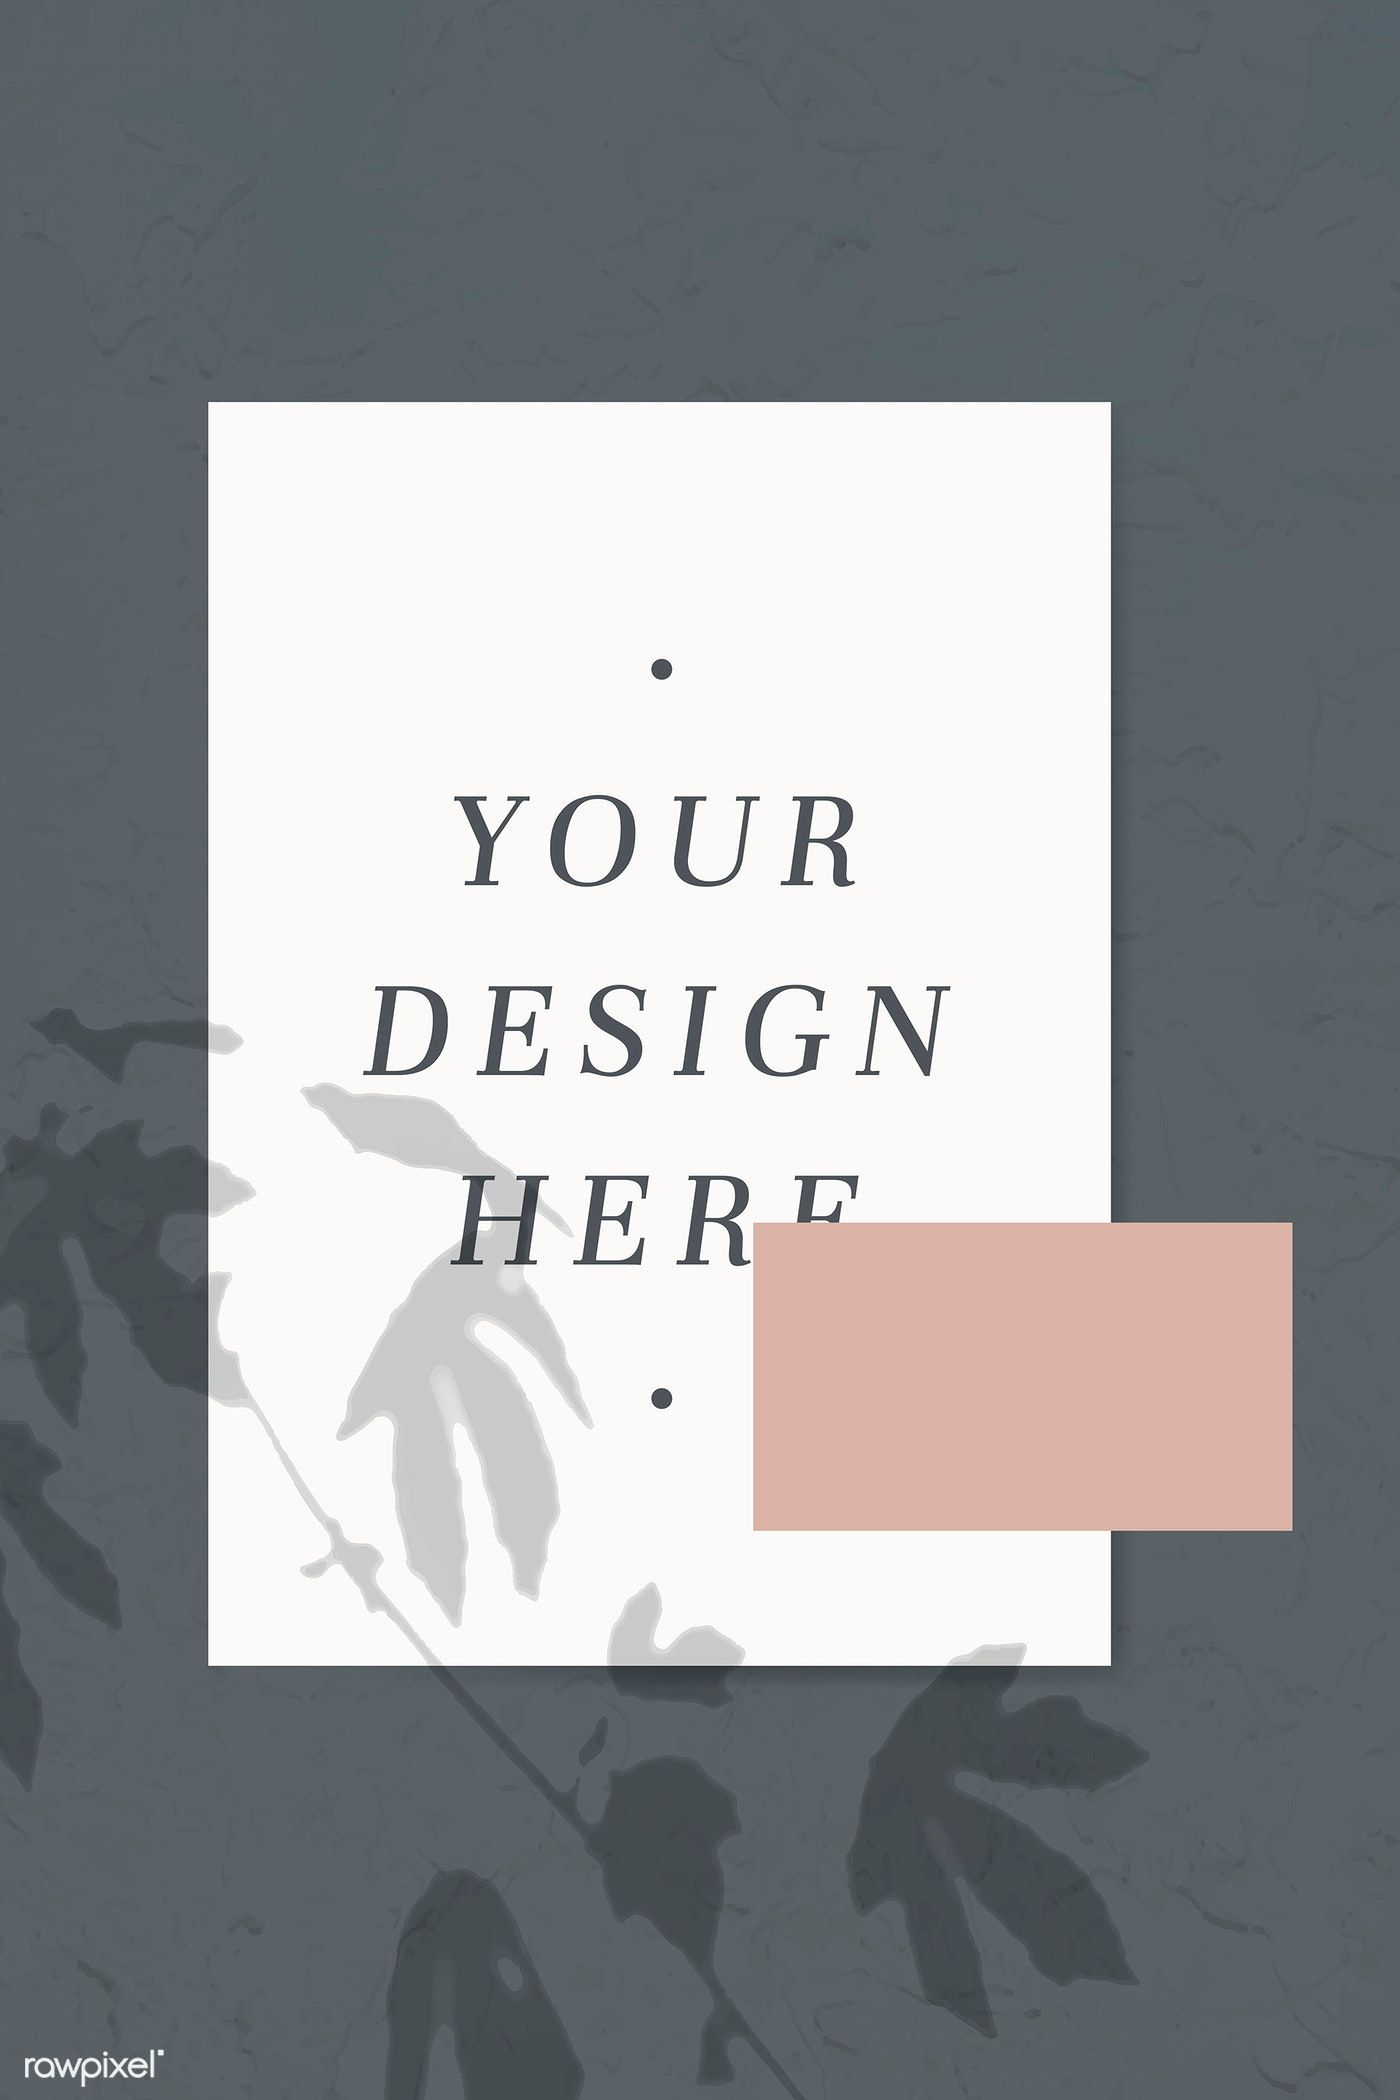 Download premium vector of Neutral color tone poster